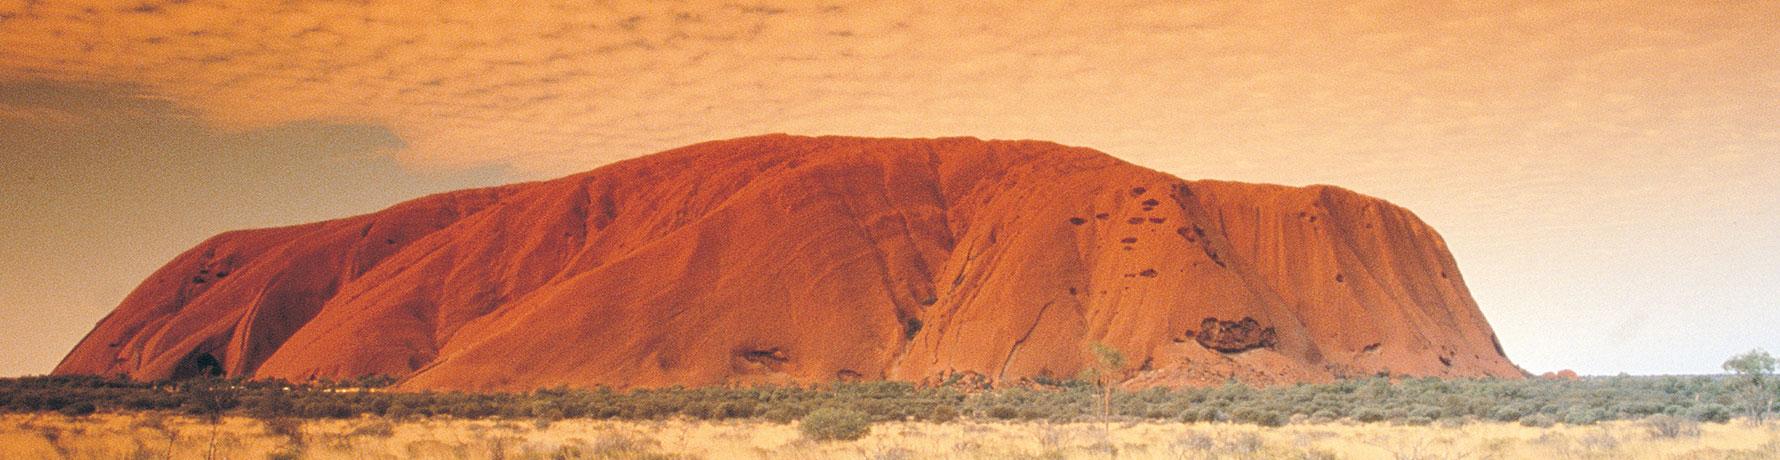 Uluru, Ayers Rock Australia